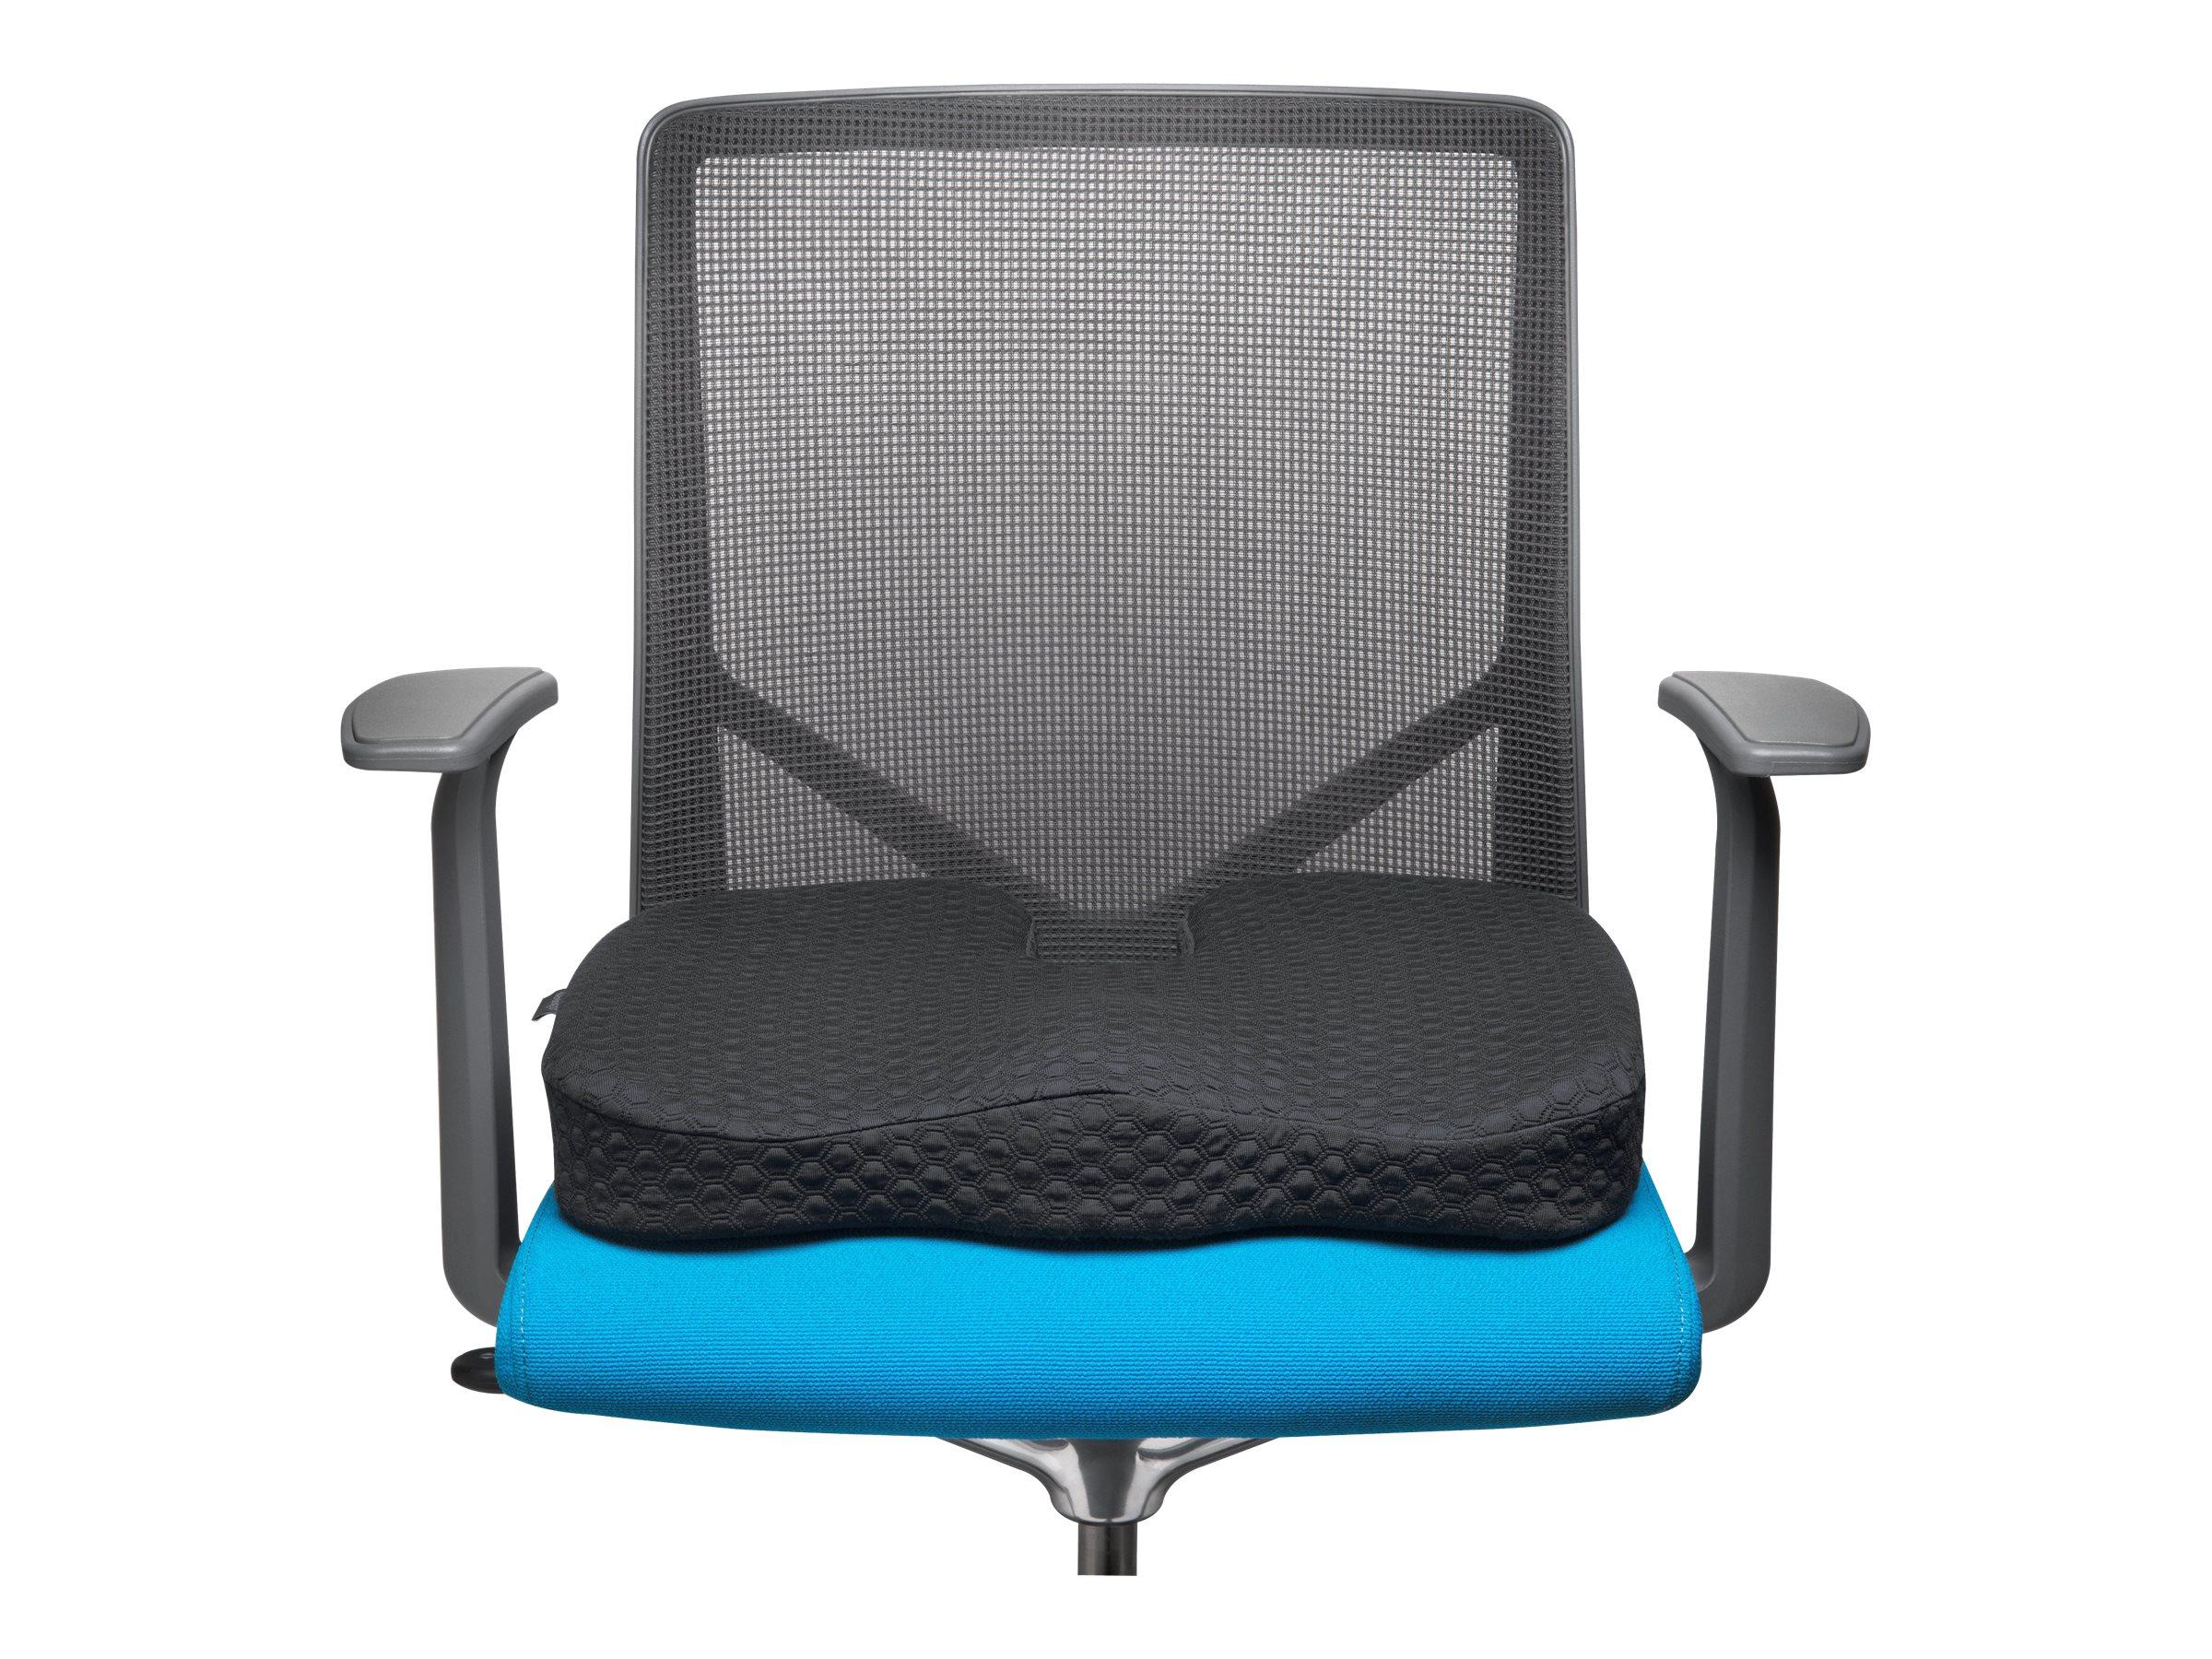 Kensington Premium Cool Gel Seat Cushion - Sitzkissen